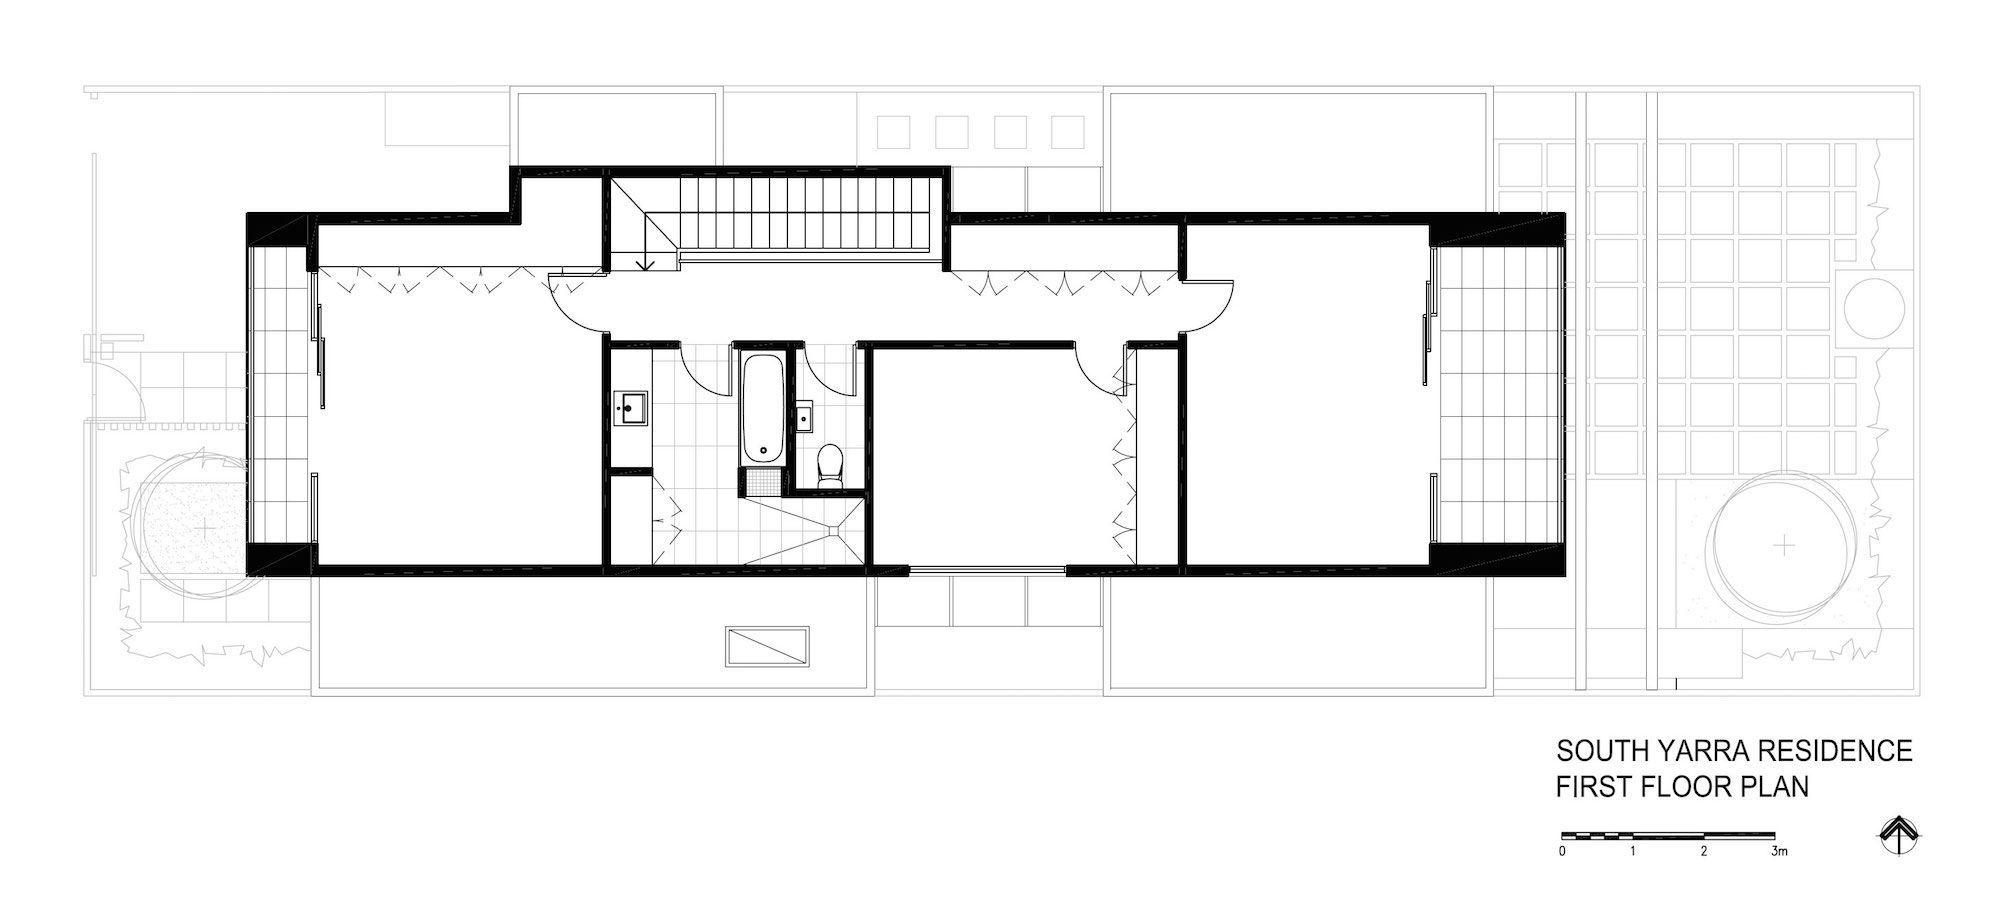 planos de casas modernas rectangulares